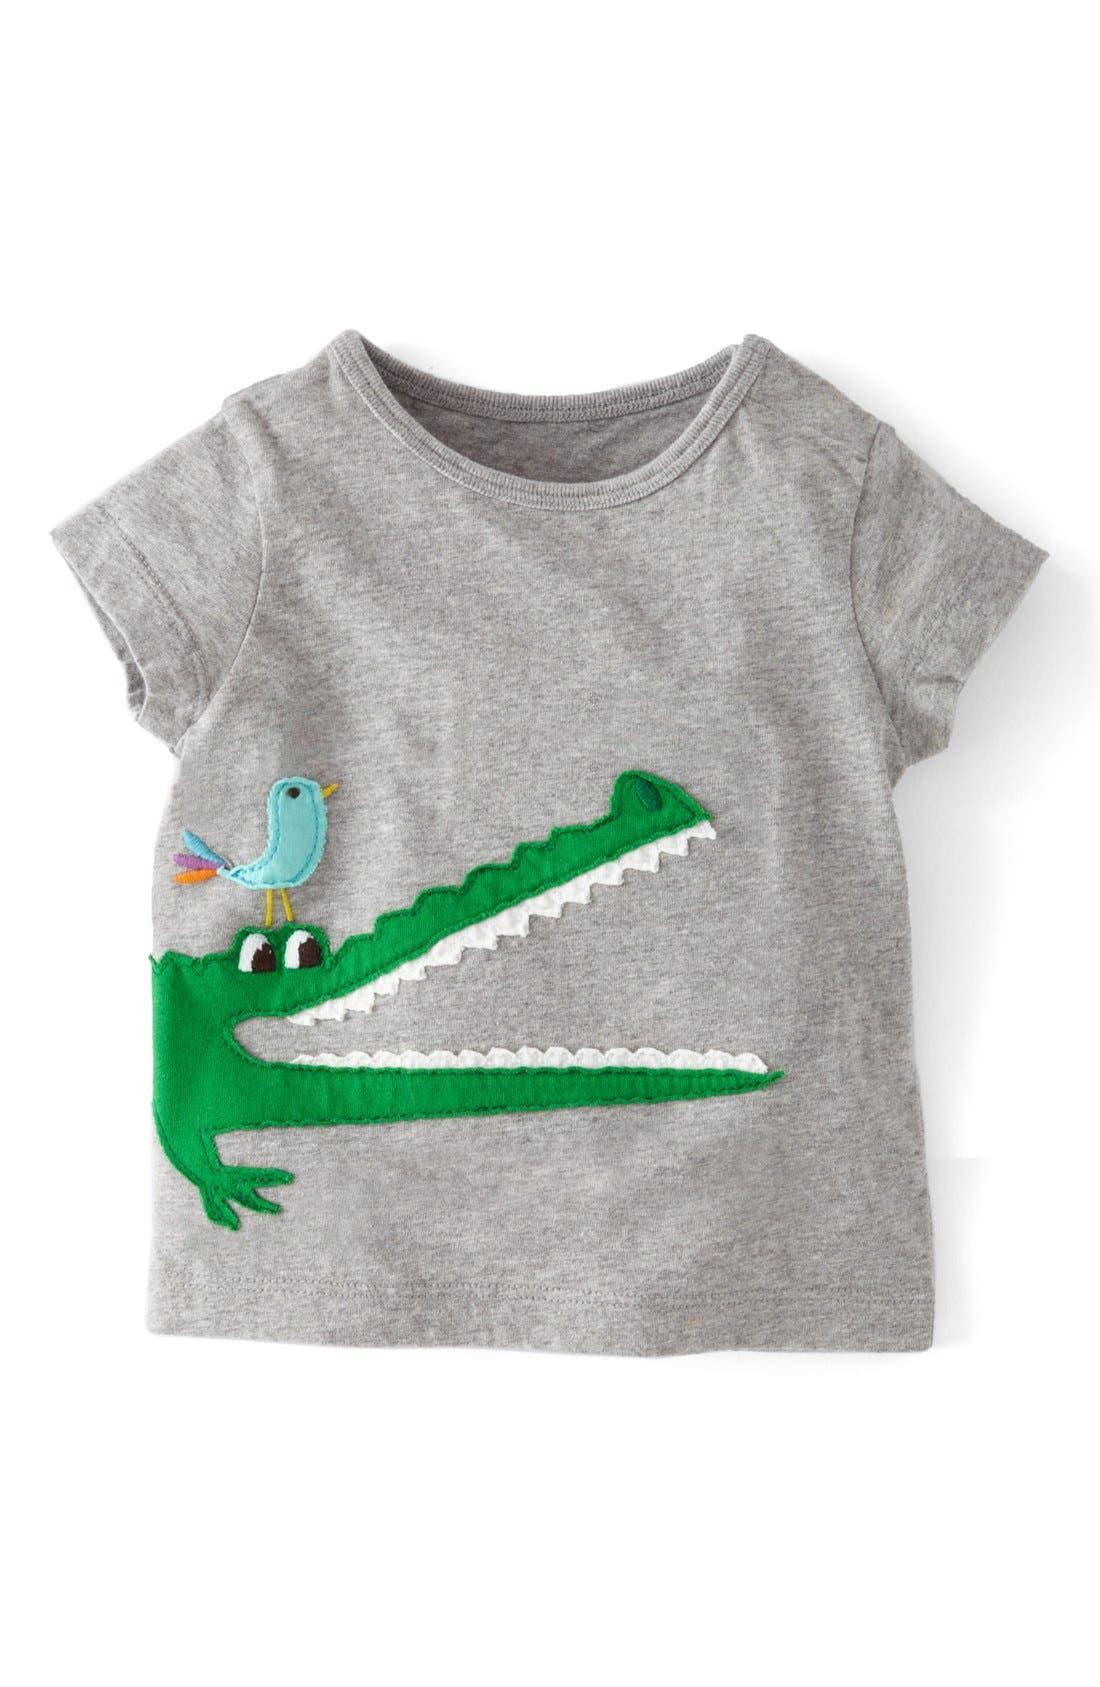 Clothes, Shoes & Accessories T-Shirts & Tops Mini Boden boy's baby cotton applique top t-shirt  new shirt tee applique logo